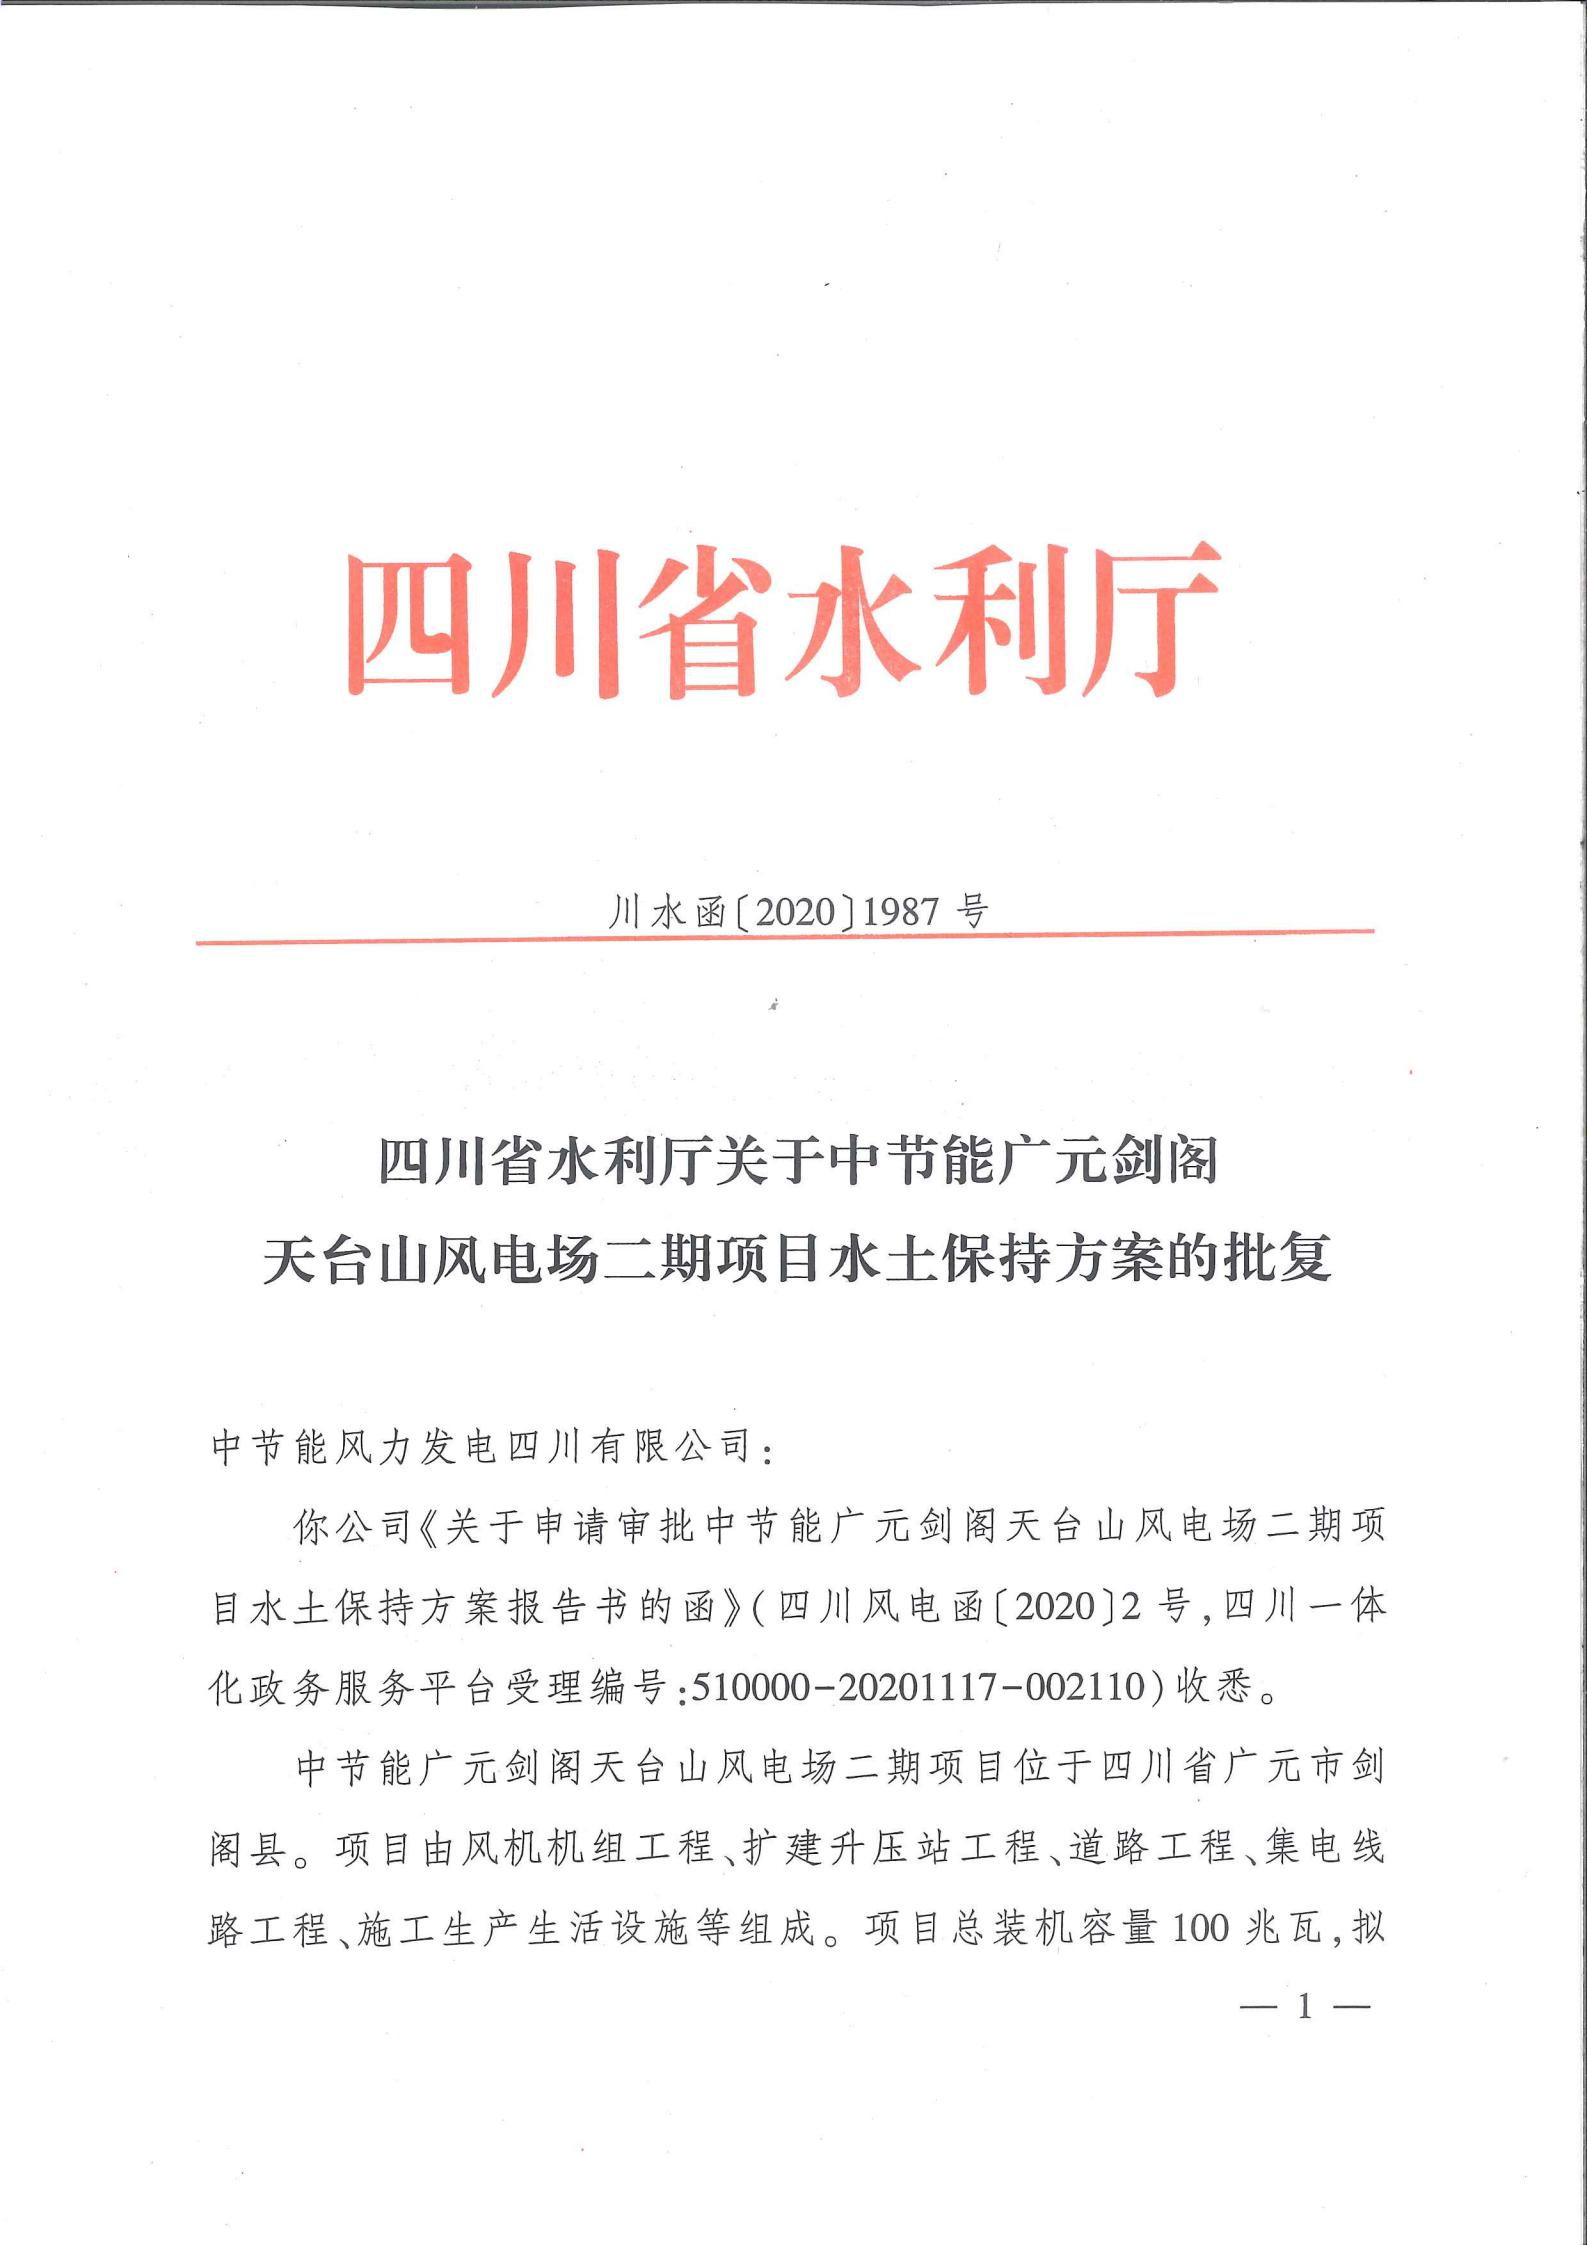 ZM2020-027 中节能广元剑阁天台山风电场二期 100MW项目水土保持方案-批复_00.jpg